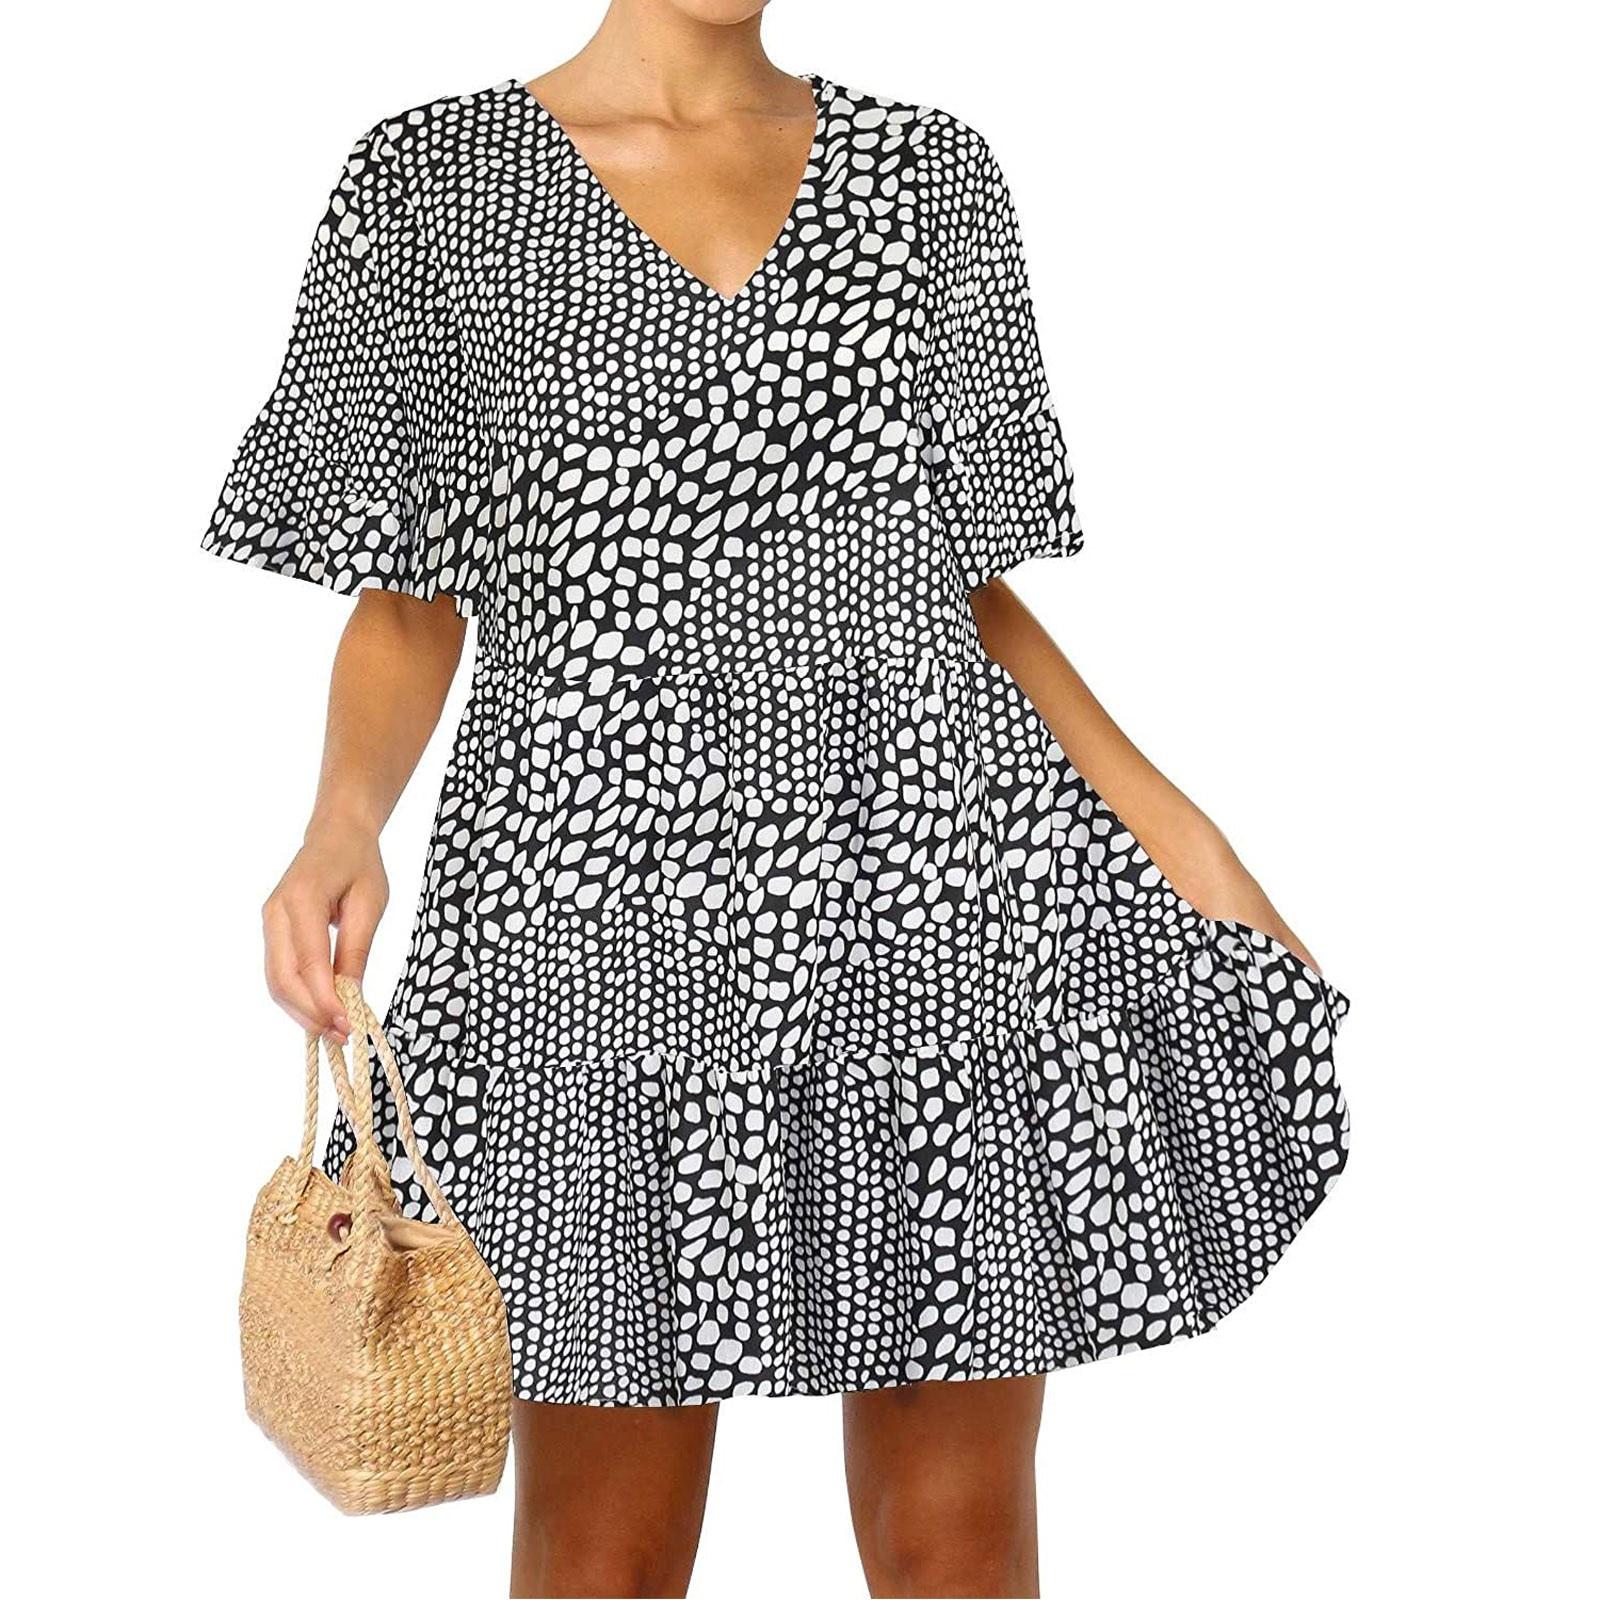 40# Boho Floral Dress Woman Flare Sleeve Ruffle Summer Dress 2021 With Pockets V Neck Loose Swing Tunic Mini Dress Vestidos